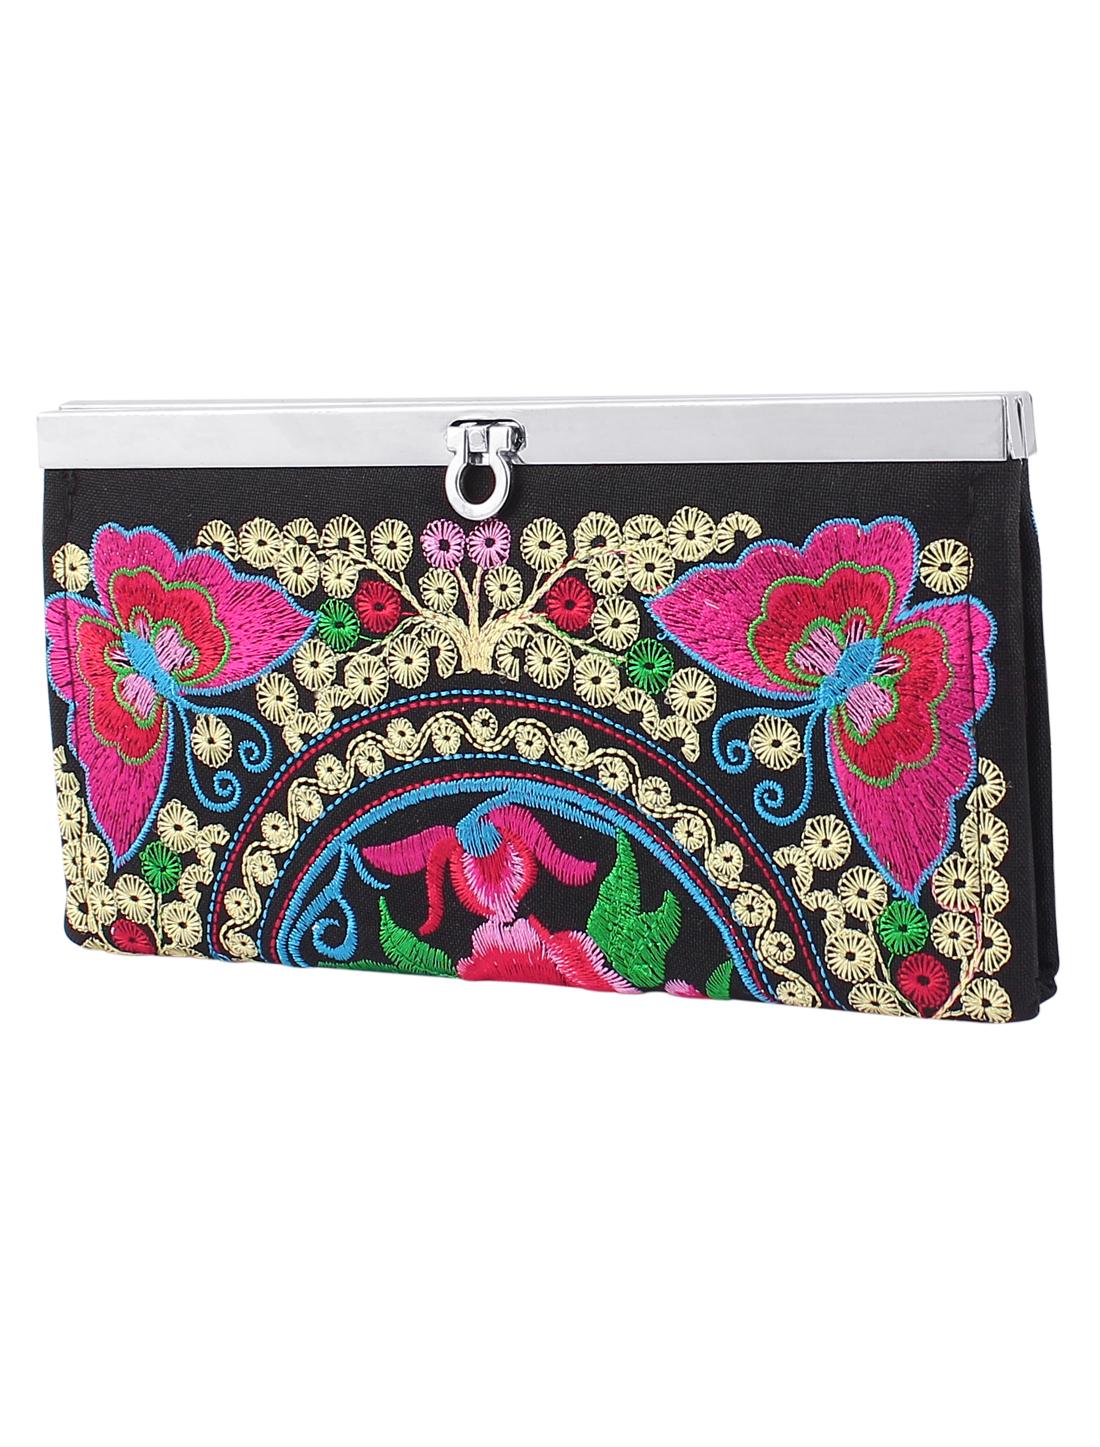 Women Embroider Flower Pattern Flip Lock Wallet Purse Clutch Handbag